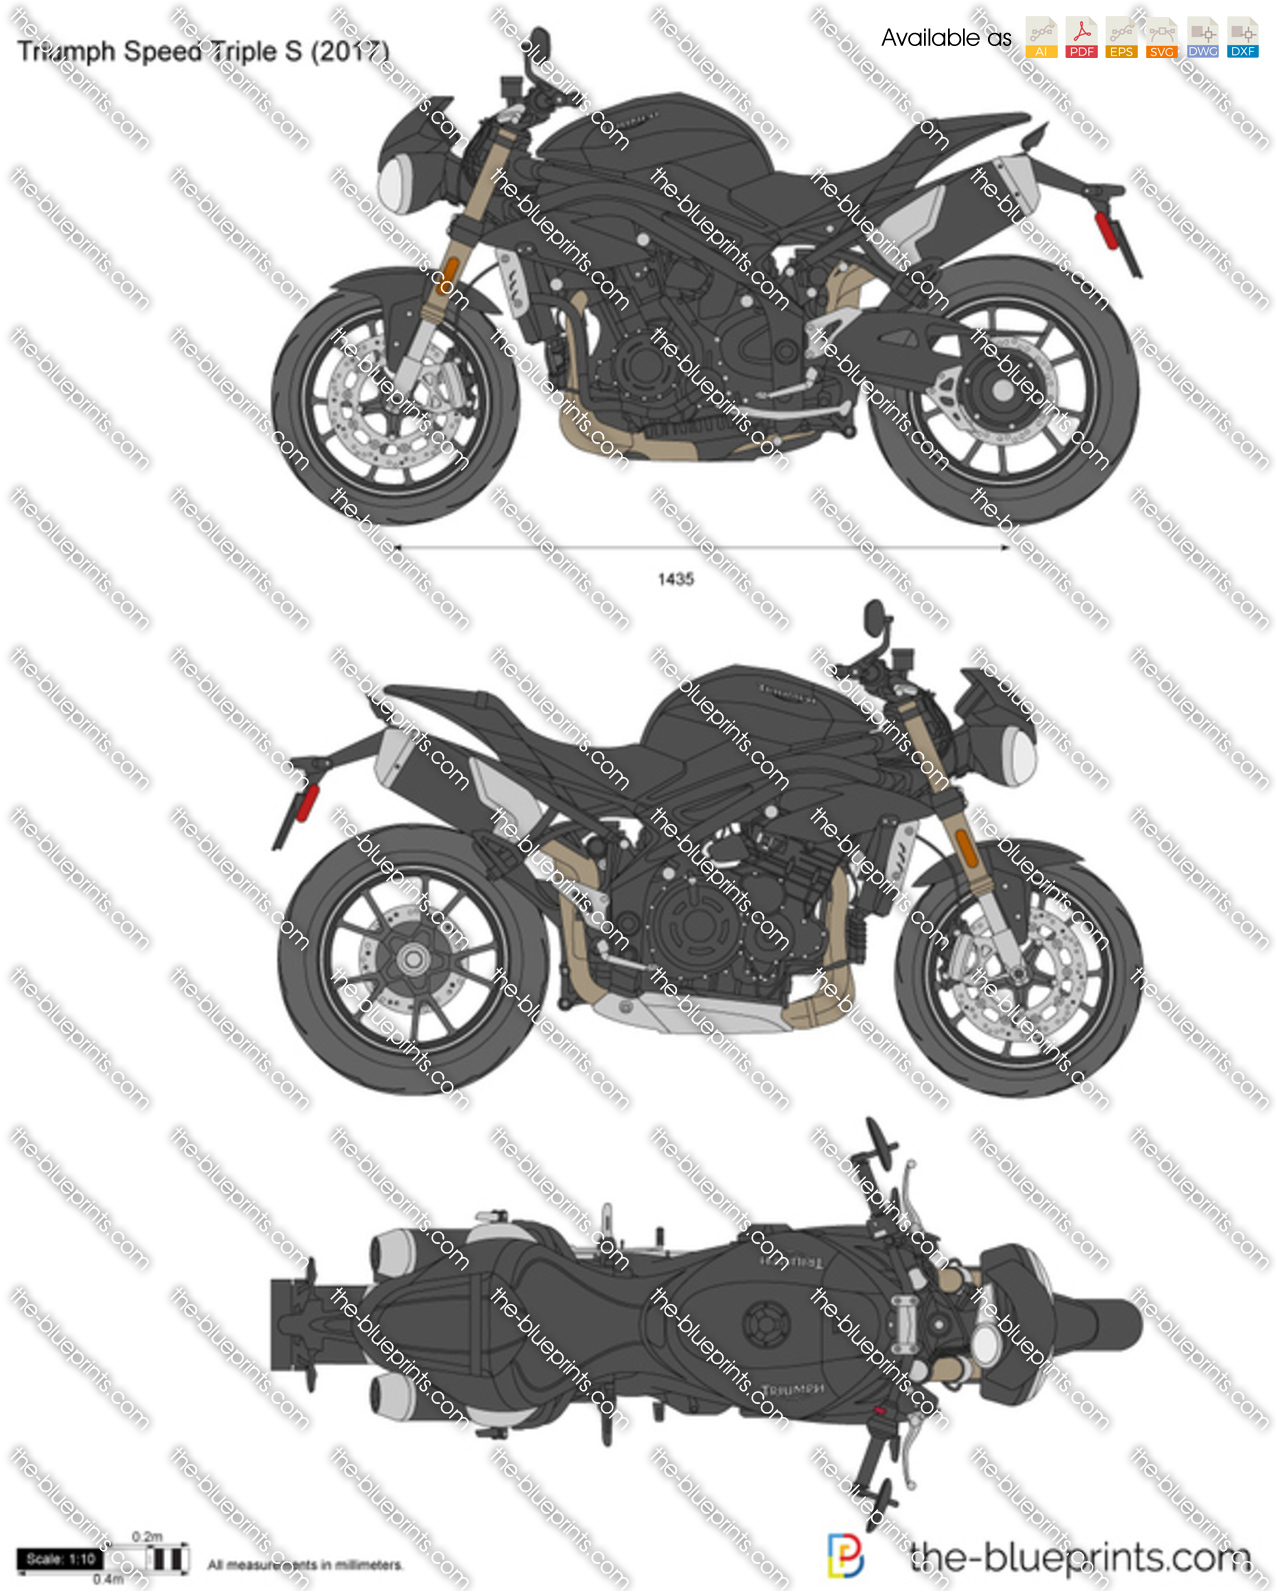 Triumph Speed Triple S